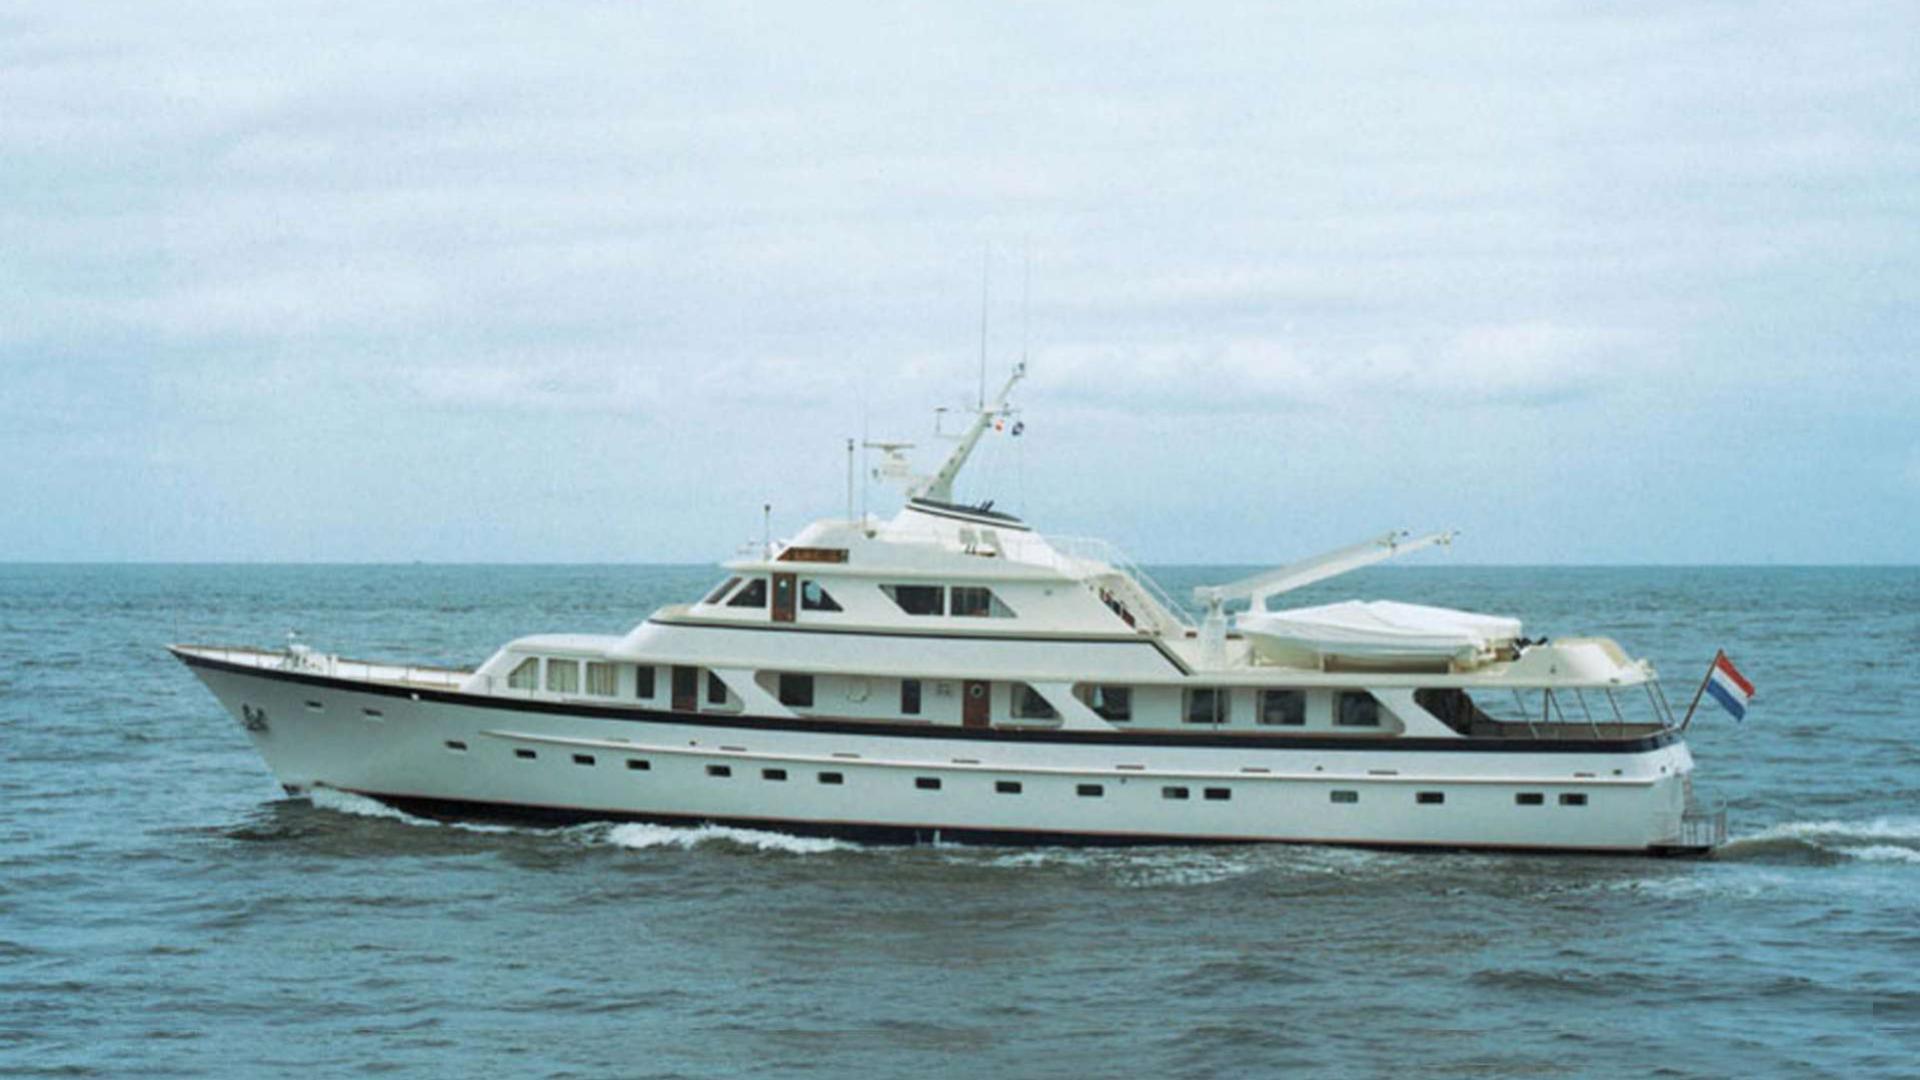 valeria-motor-yacht-feadship-1974-44m-curising